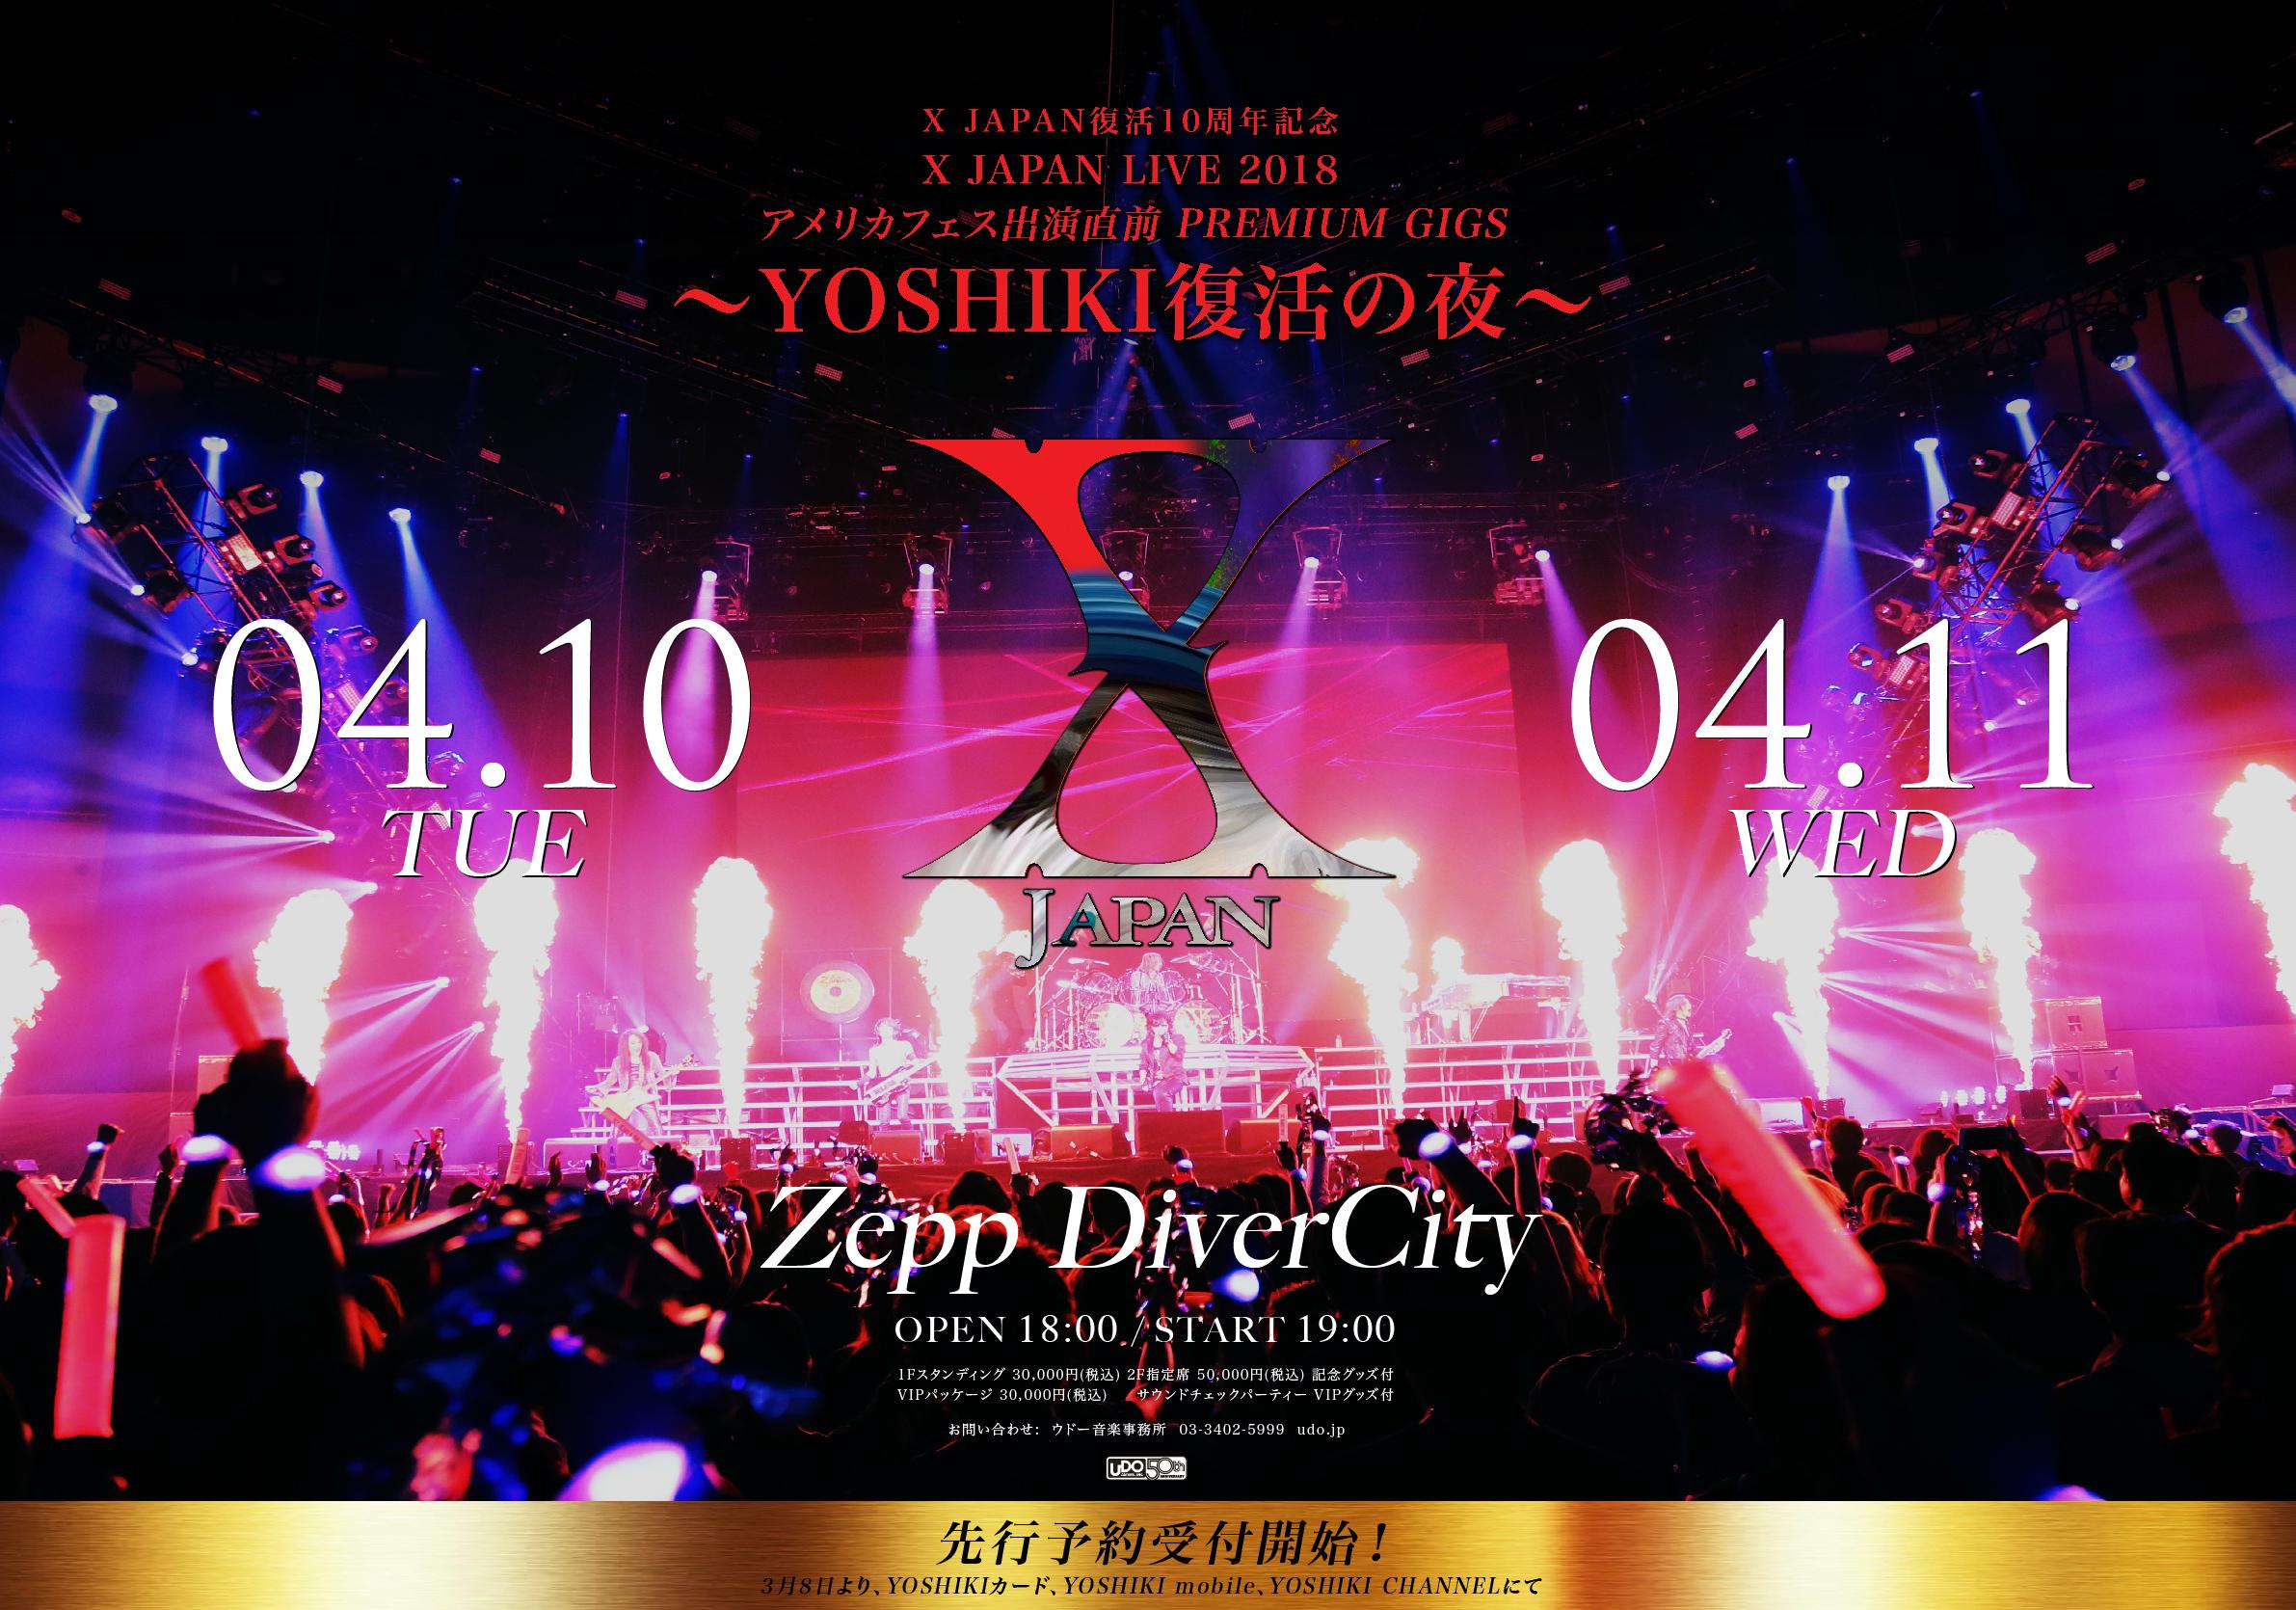 RMMS-X-Japan-Zepp-Divercity-2018-promo1